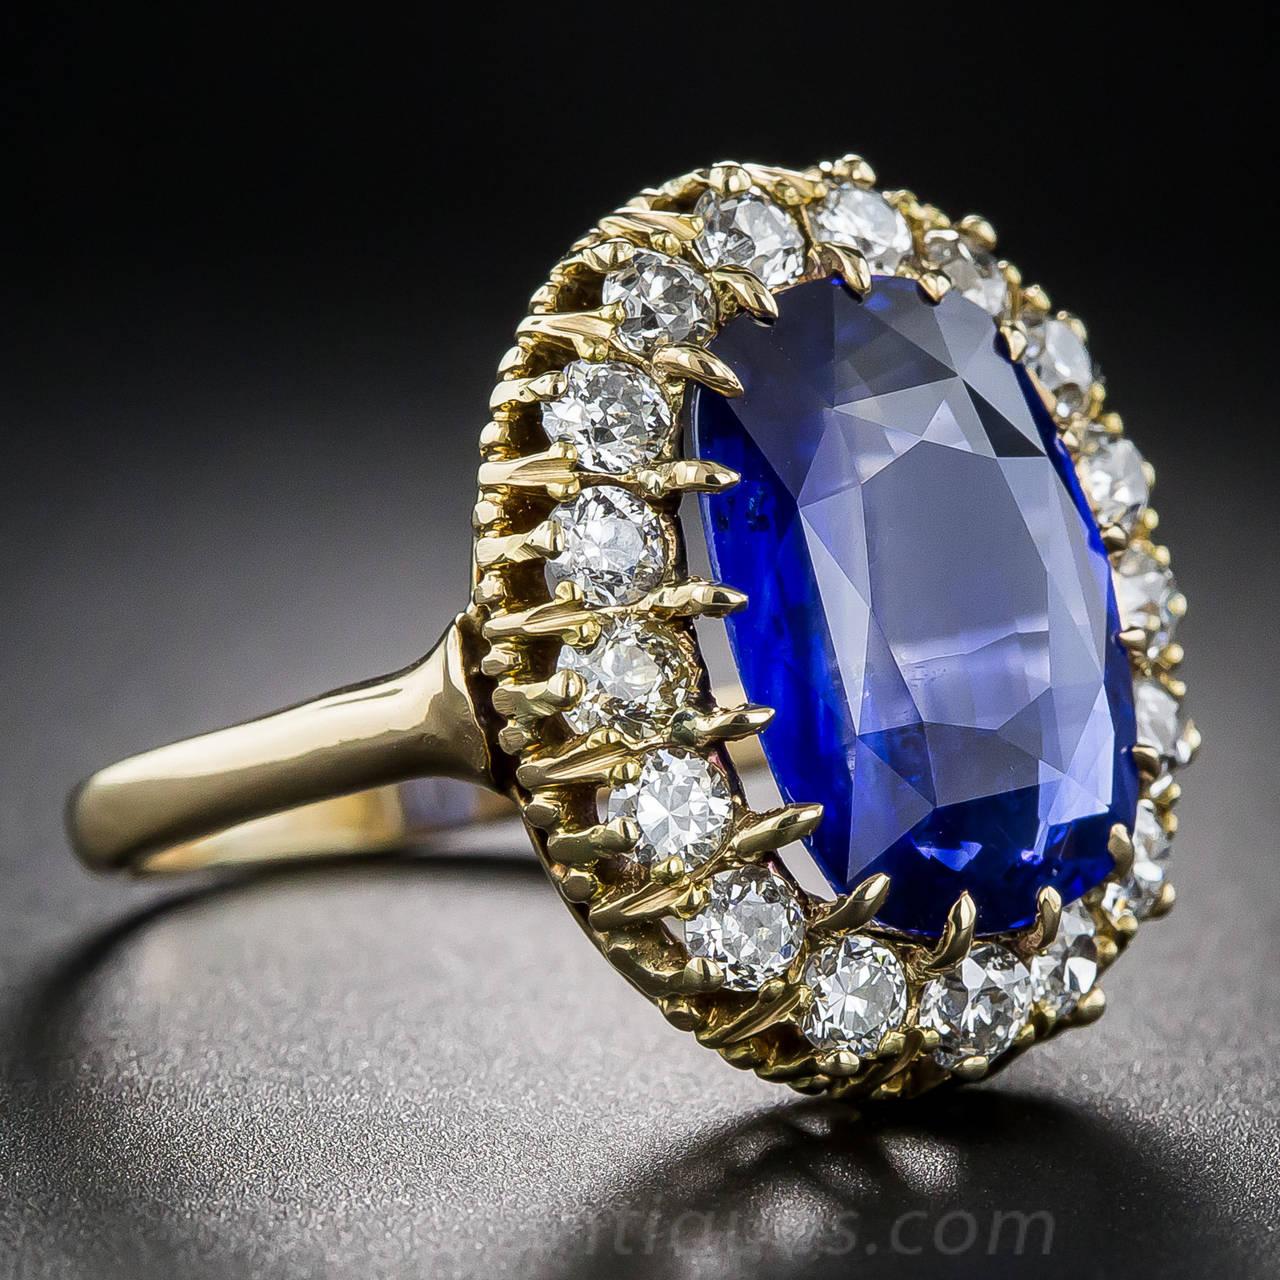 768 Carat Sapphire Diamond Antique Cluster Ring 3